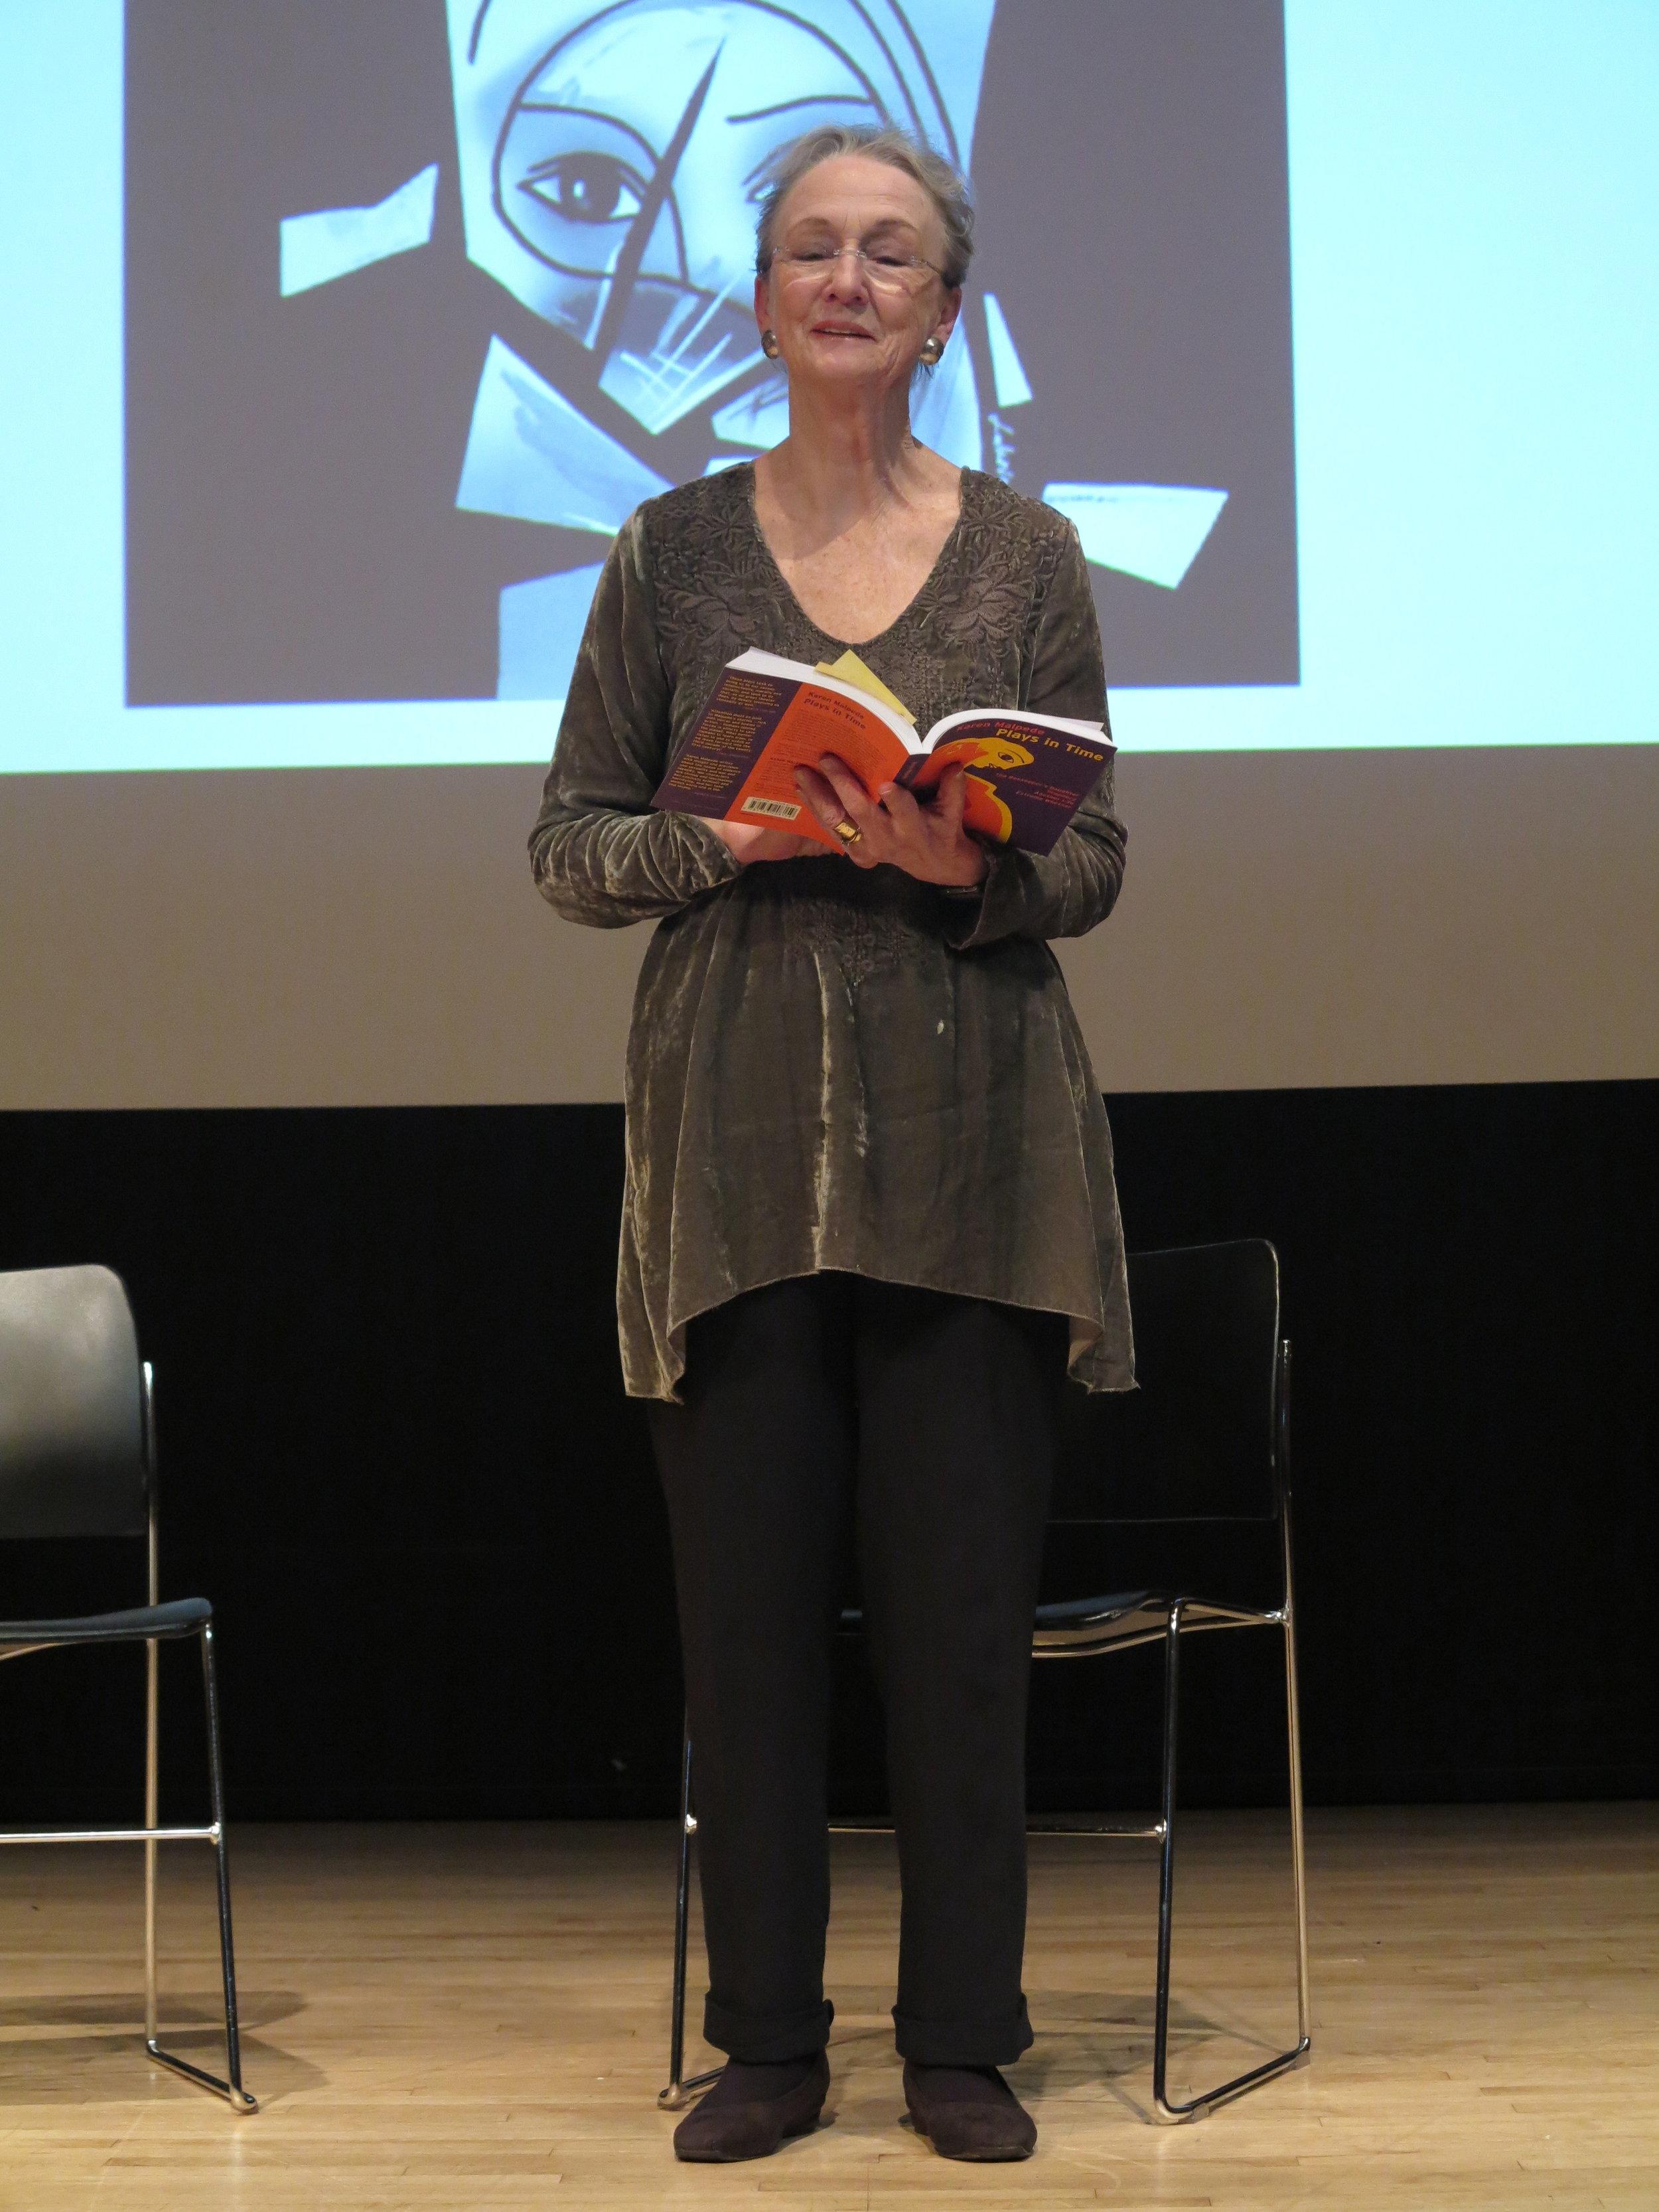 Kathleen Chalfant